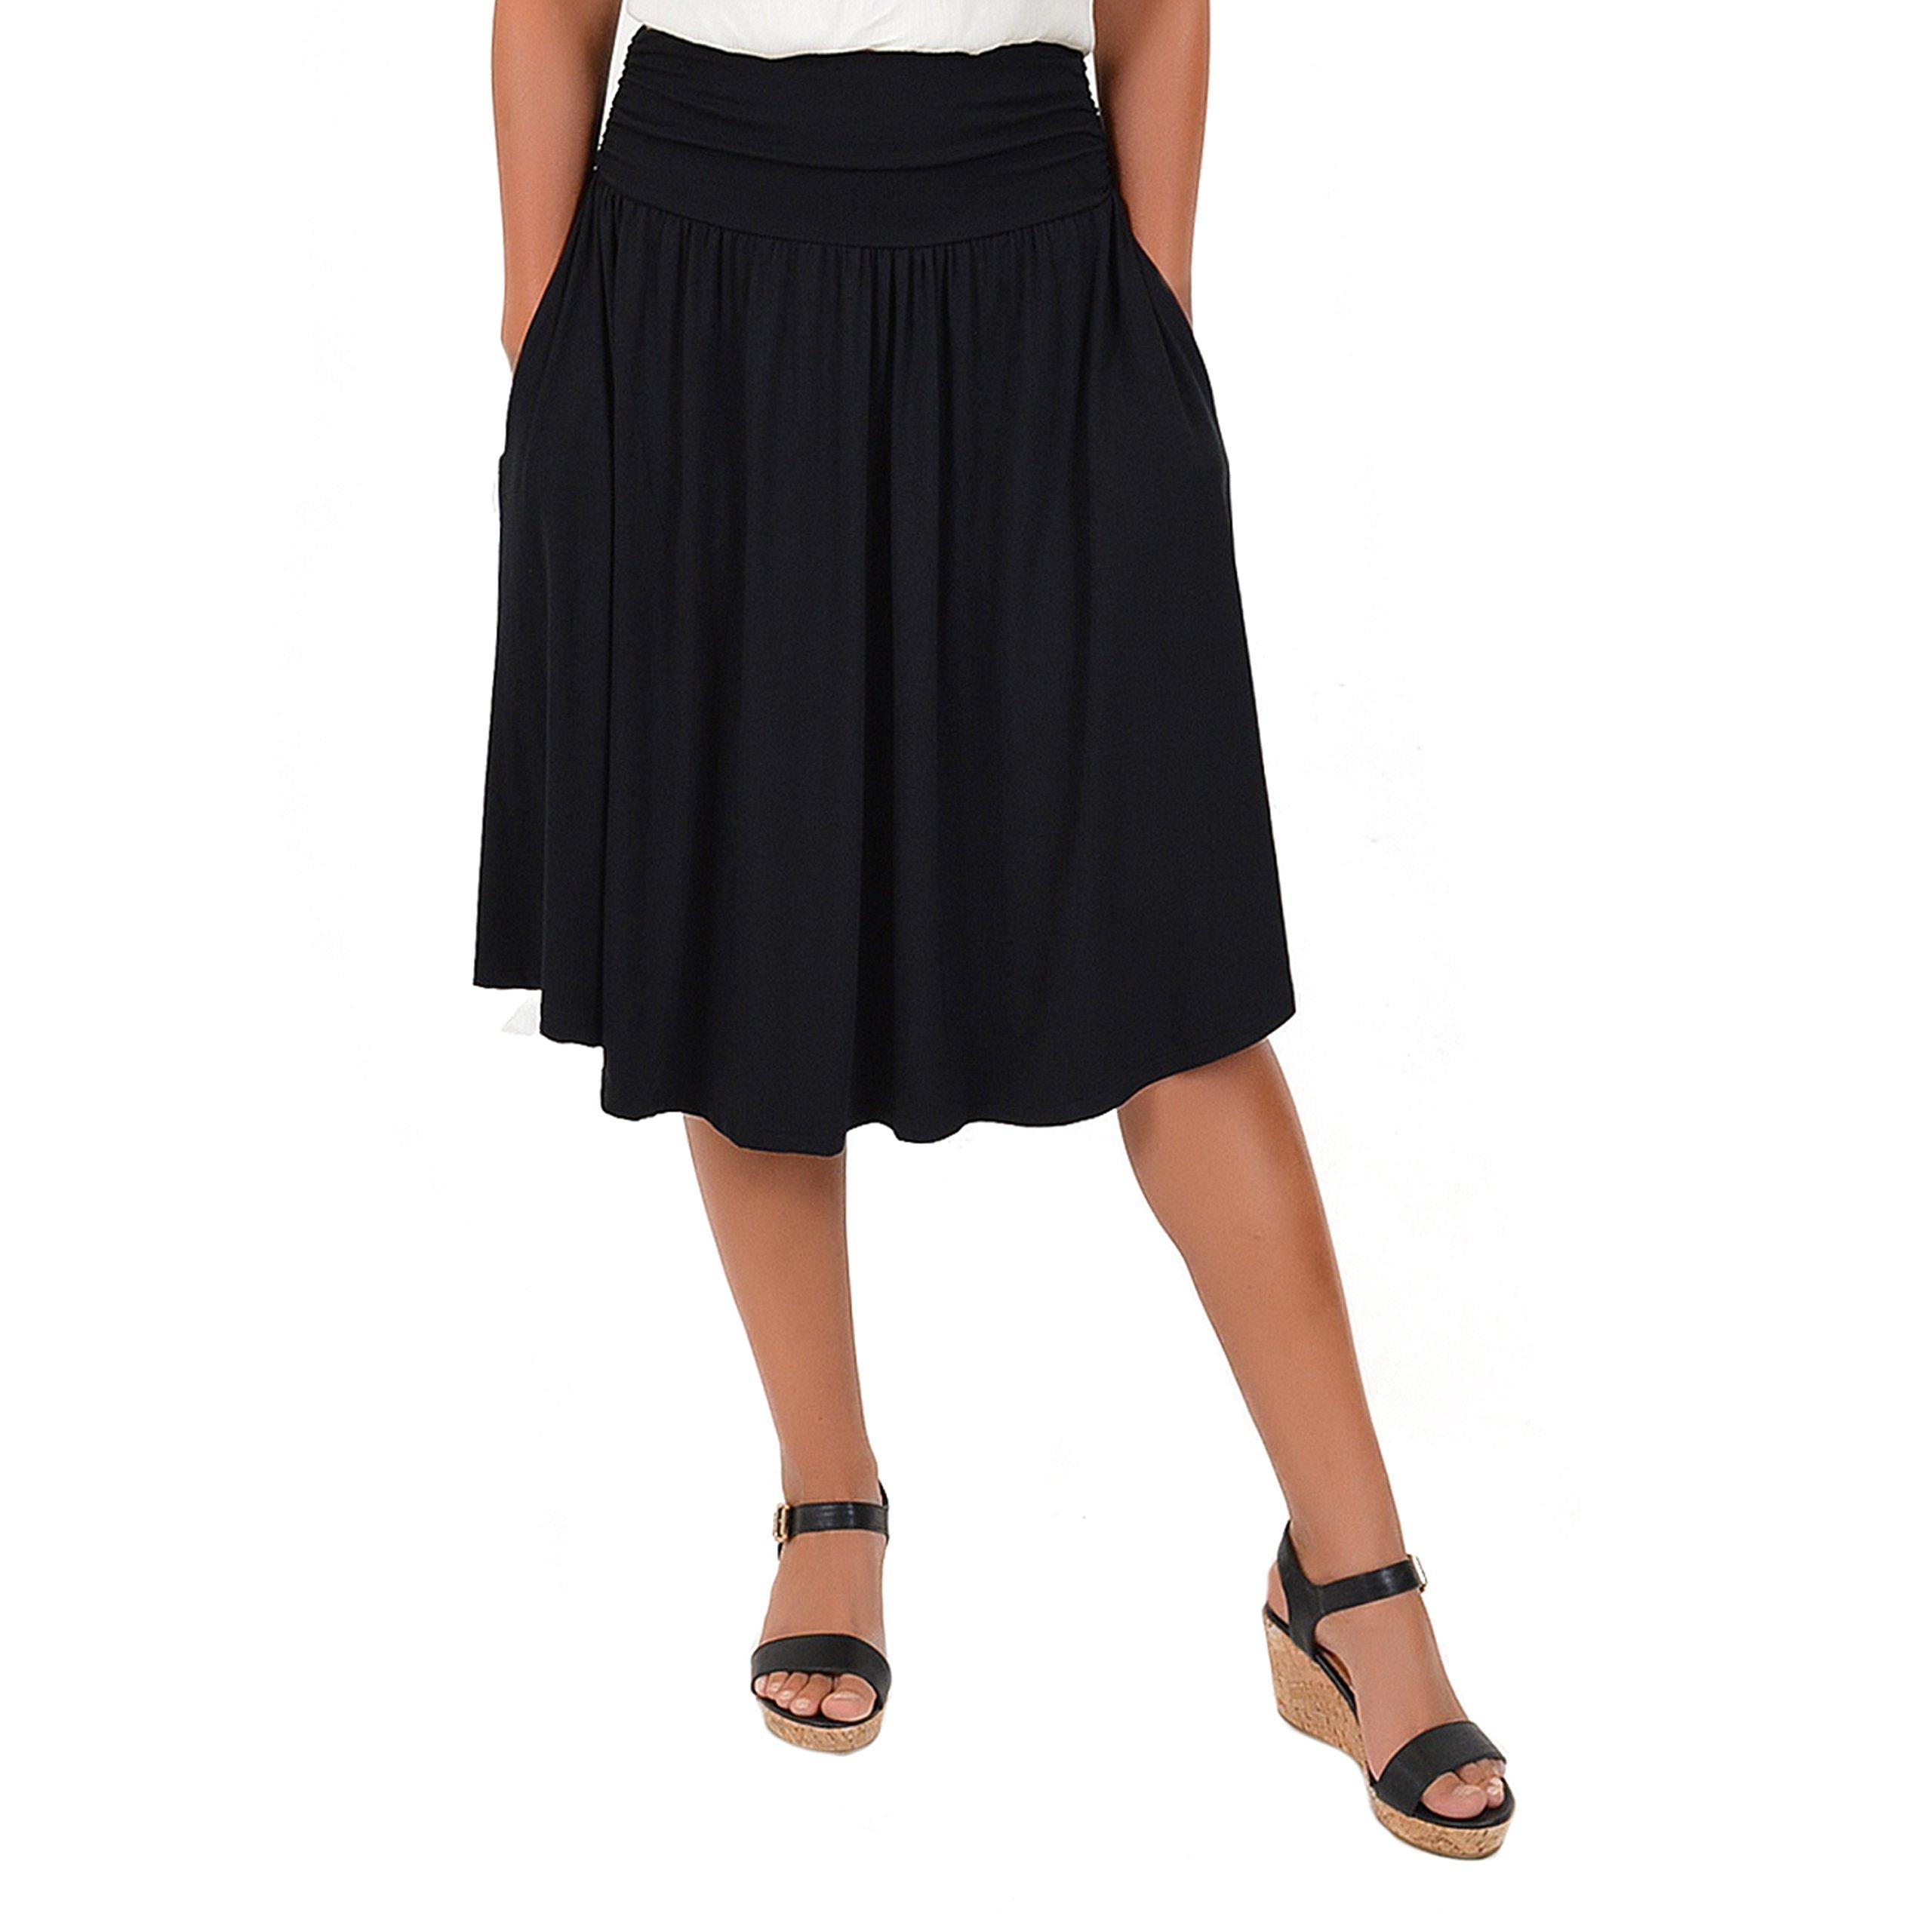 Stretch is Comfort Women's Pocket Skirt Black Large